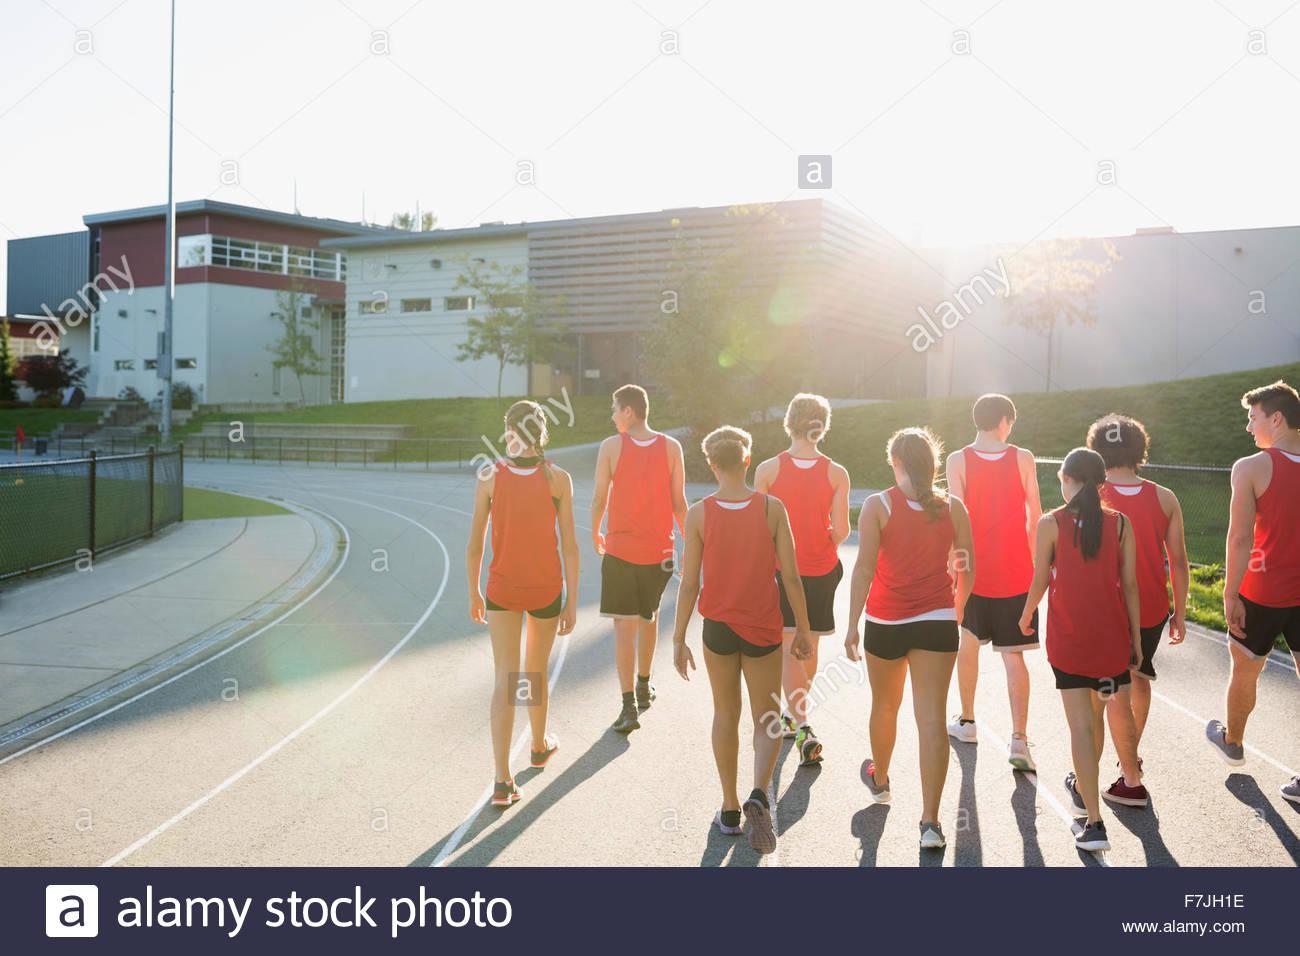 High school equipo de pista y campo running track Imagen De Stock